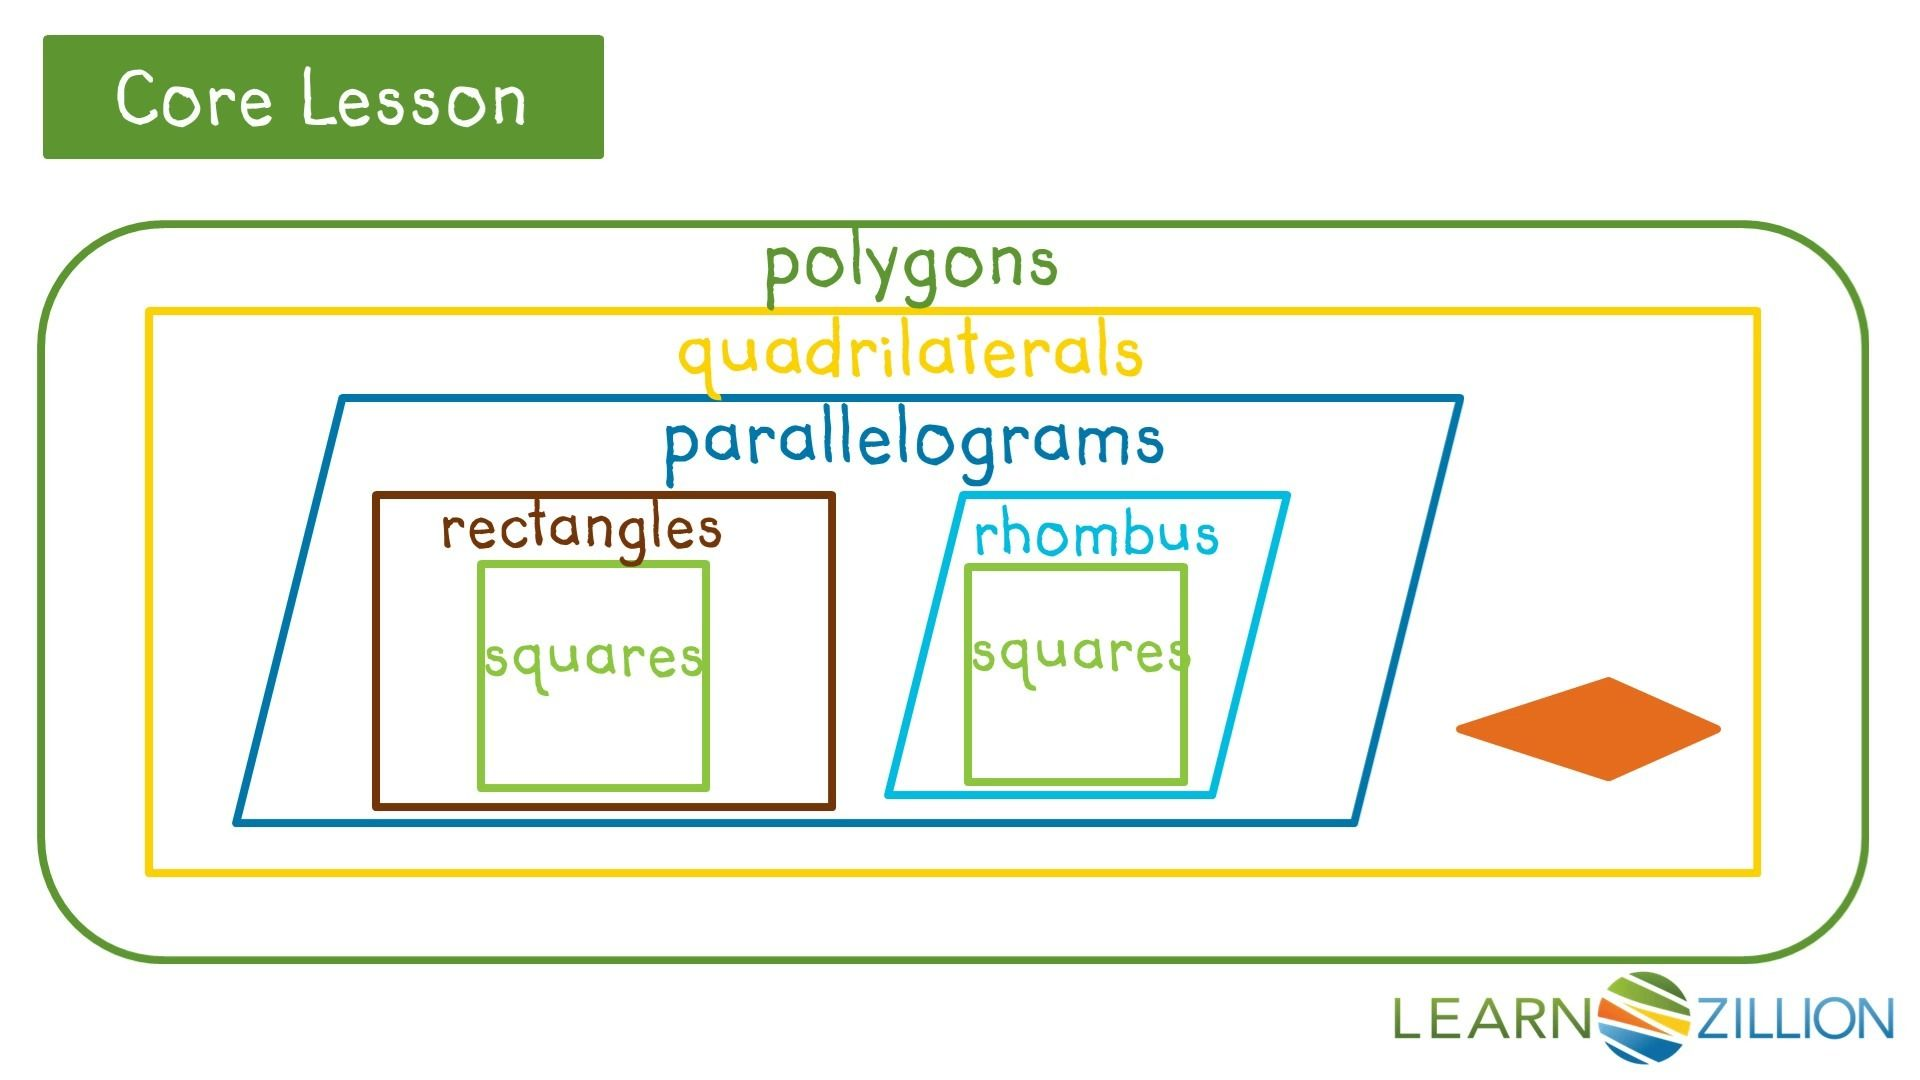 Grade 5 Quadrilateral Hierarchy